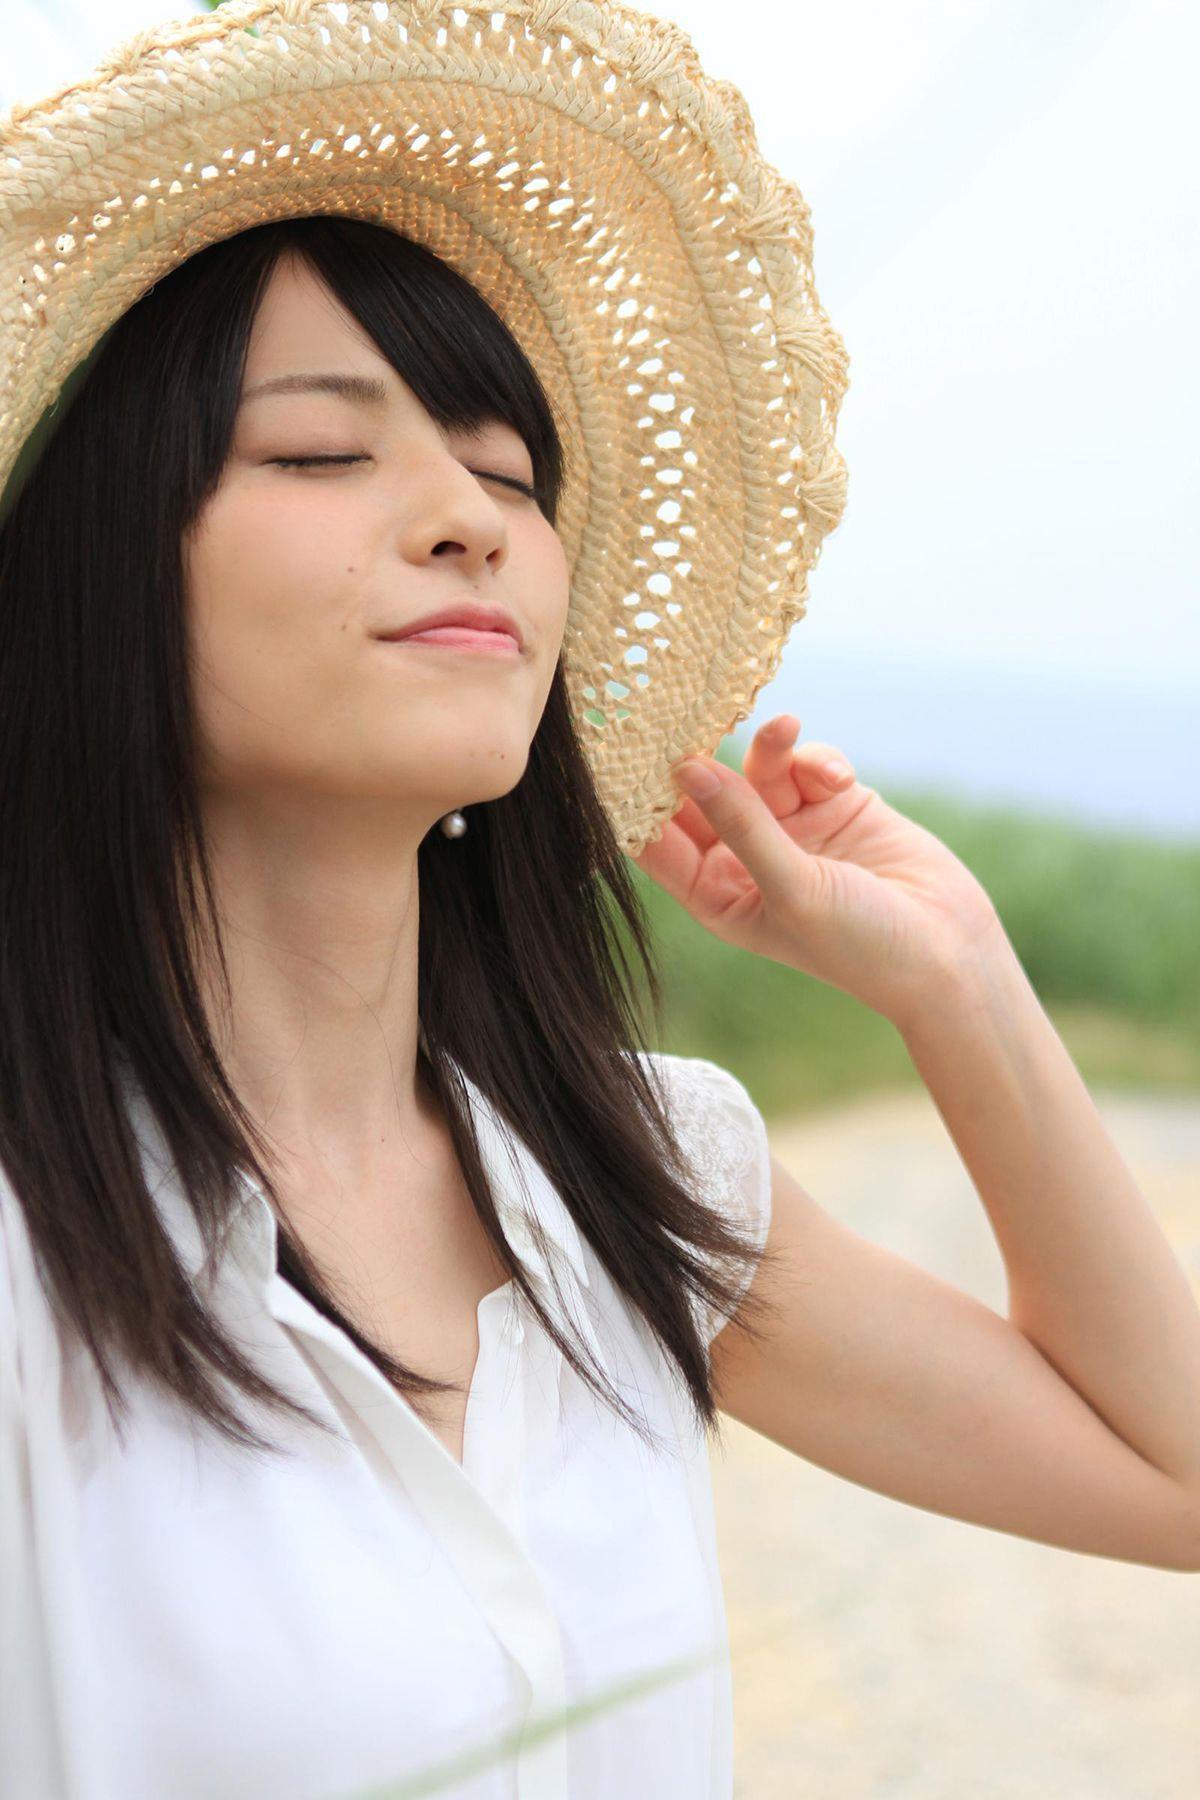 矢島舞美 エロ画像 36